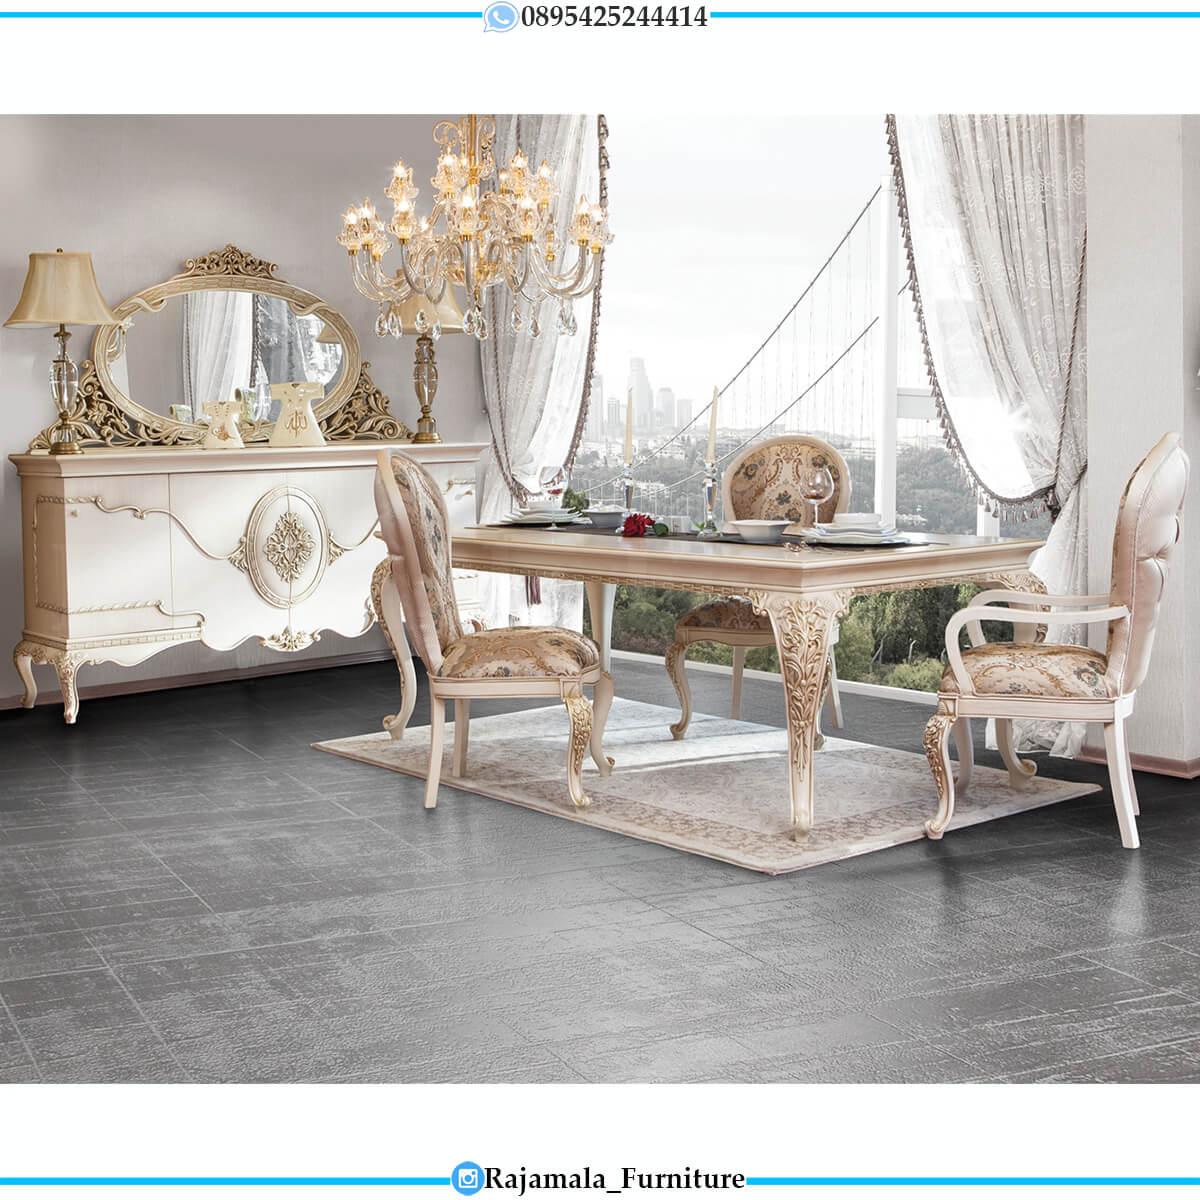 Beauty Style Meja Makan Mewah Terbaru Luxurious Epic Design RM-0713